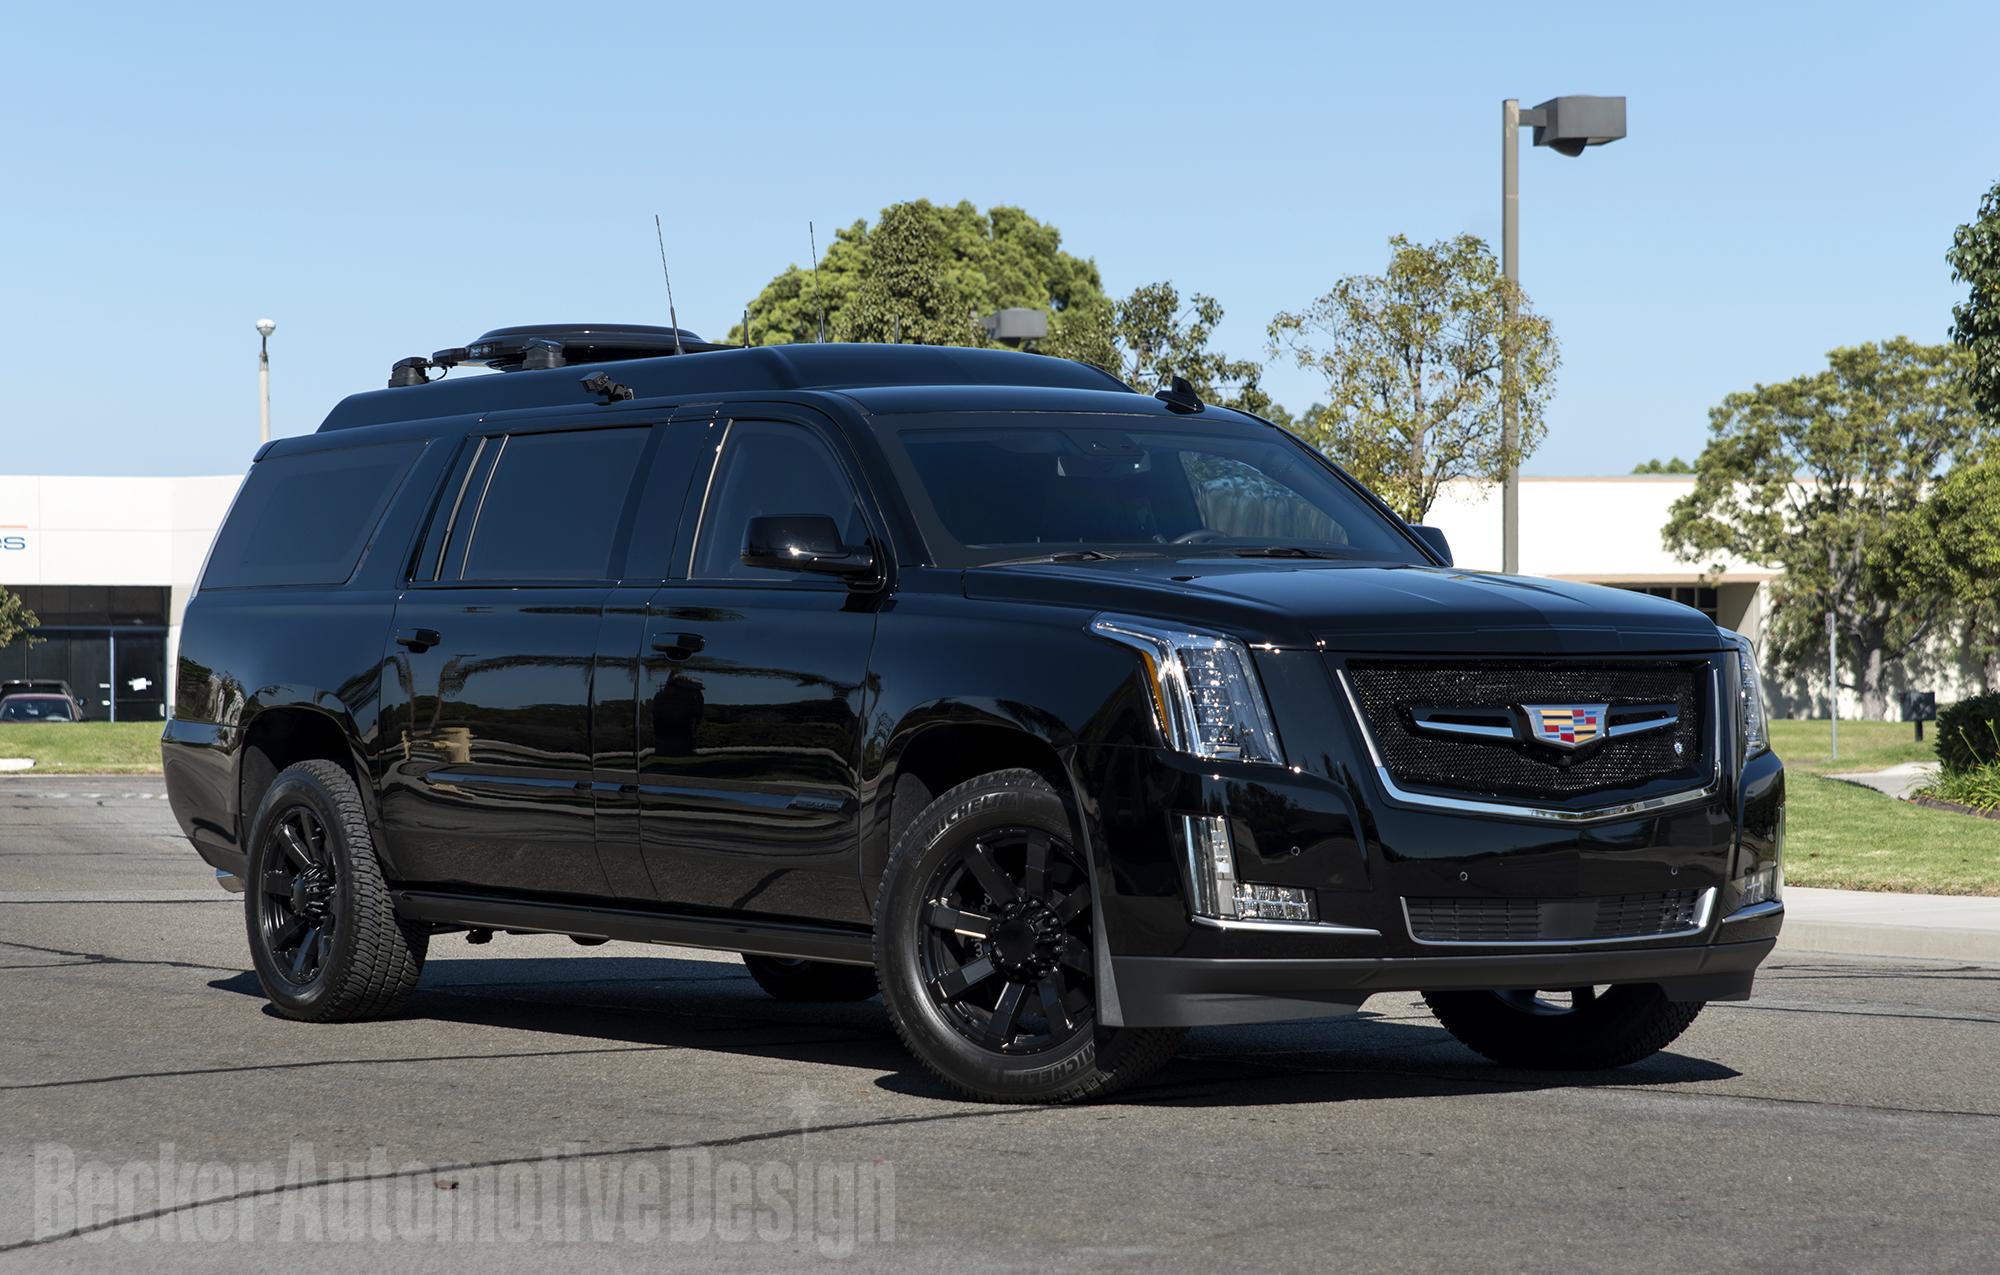 Tps Premium Luxury Tps Armoring